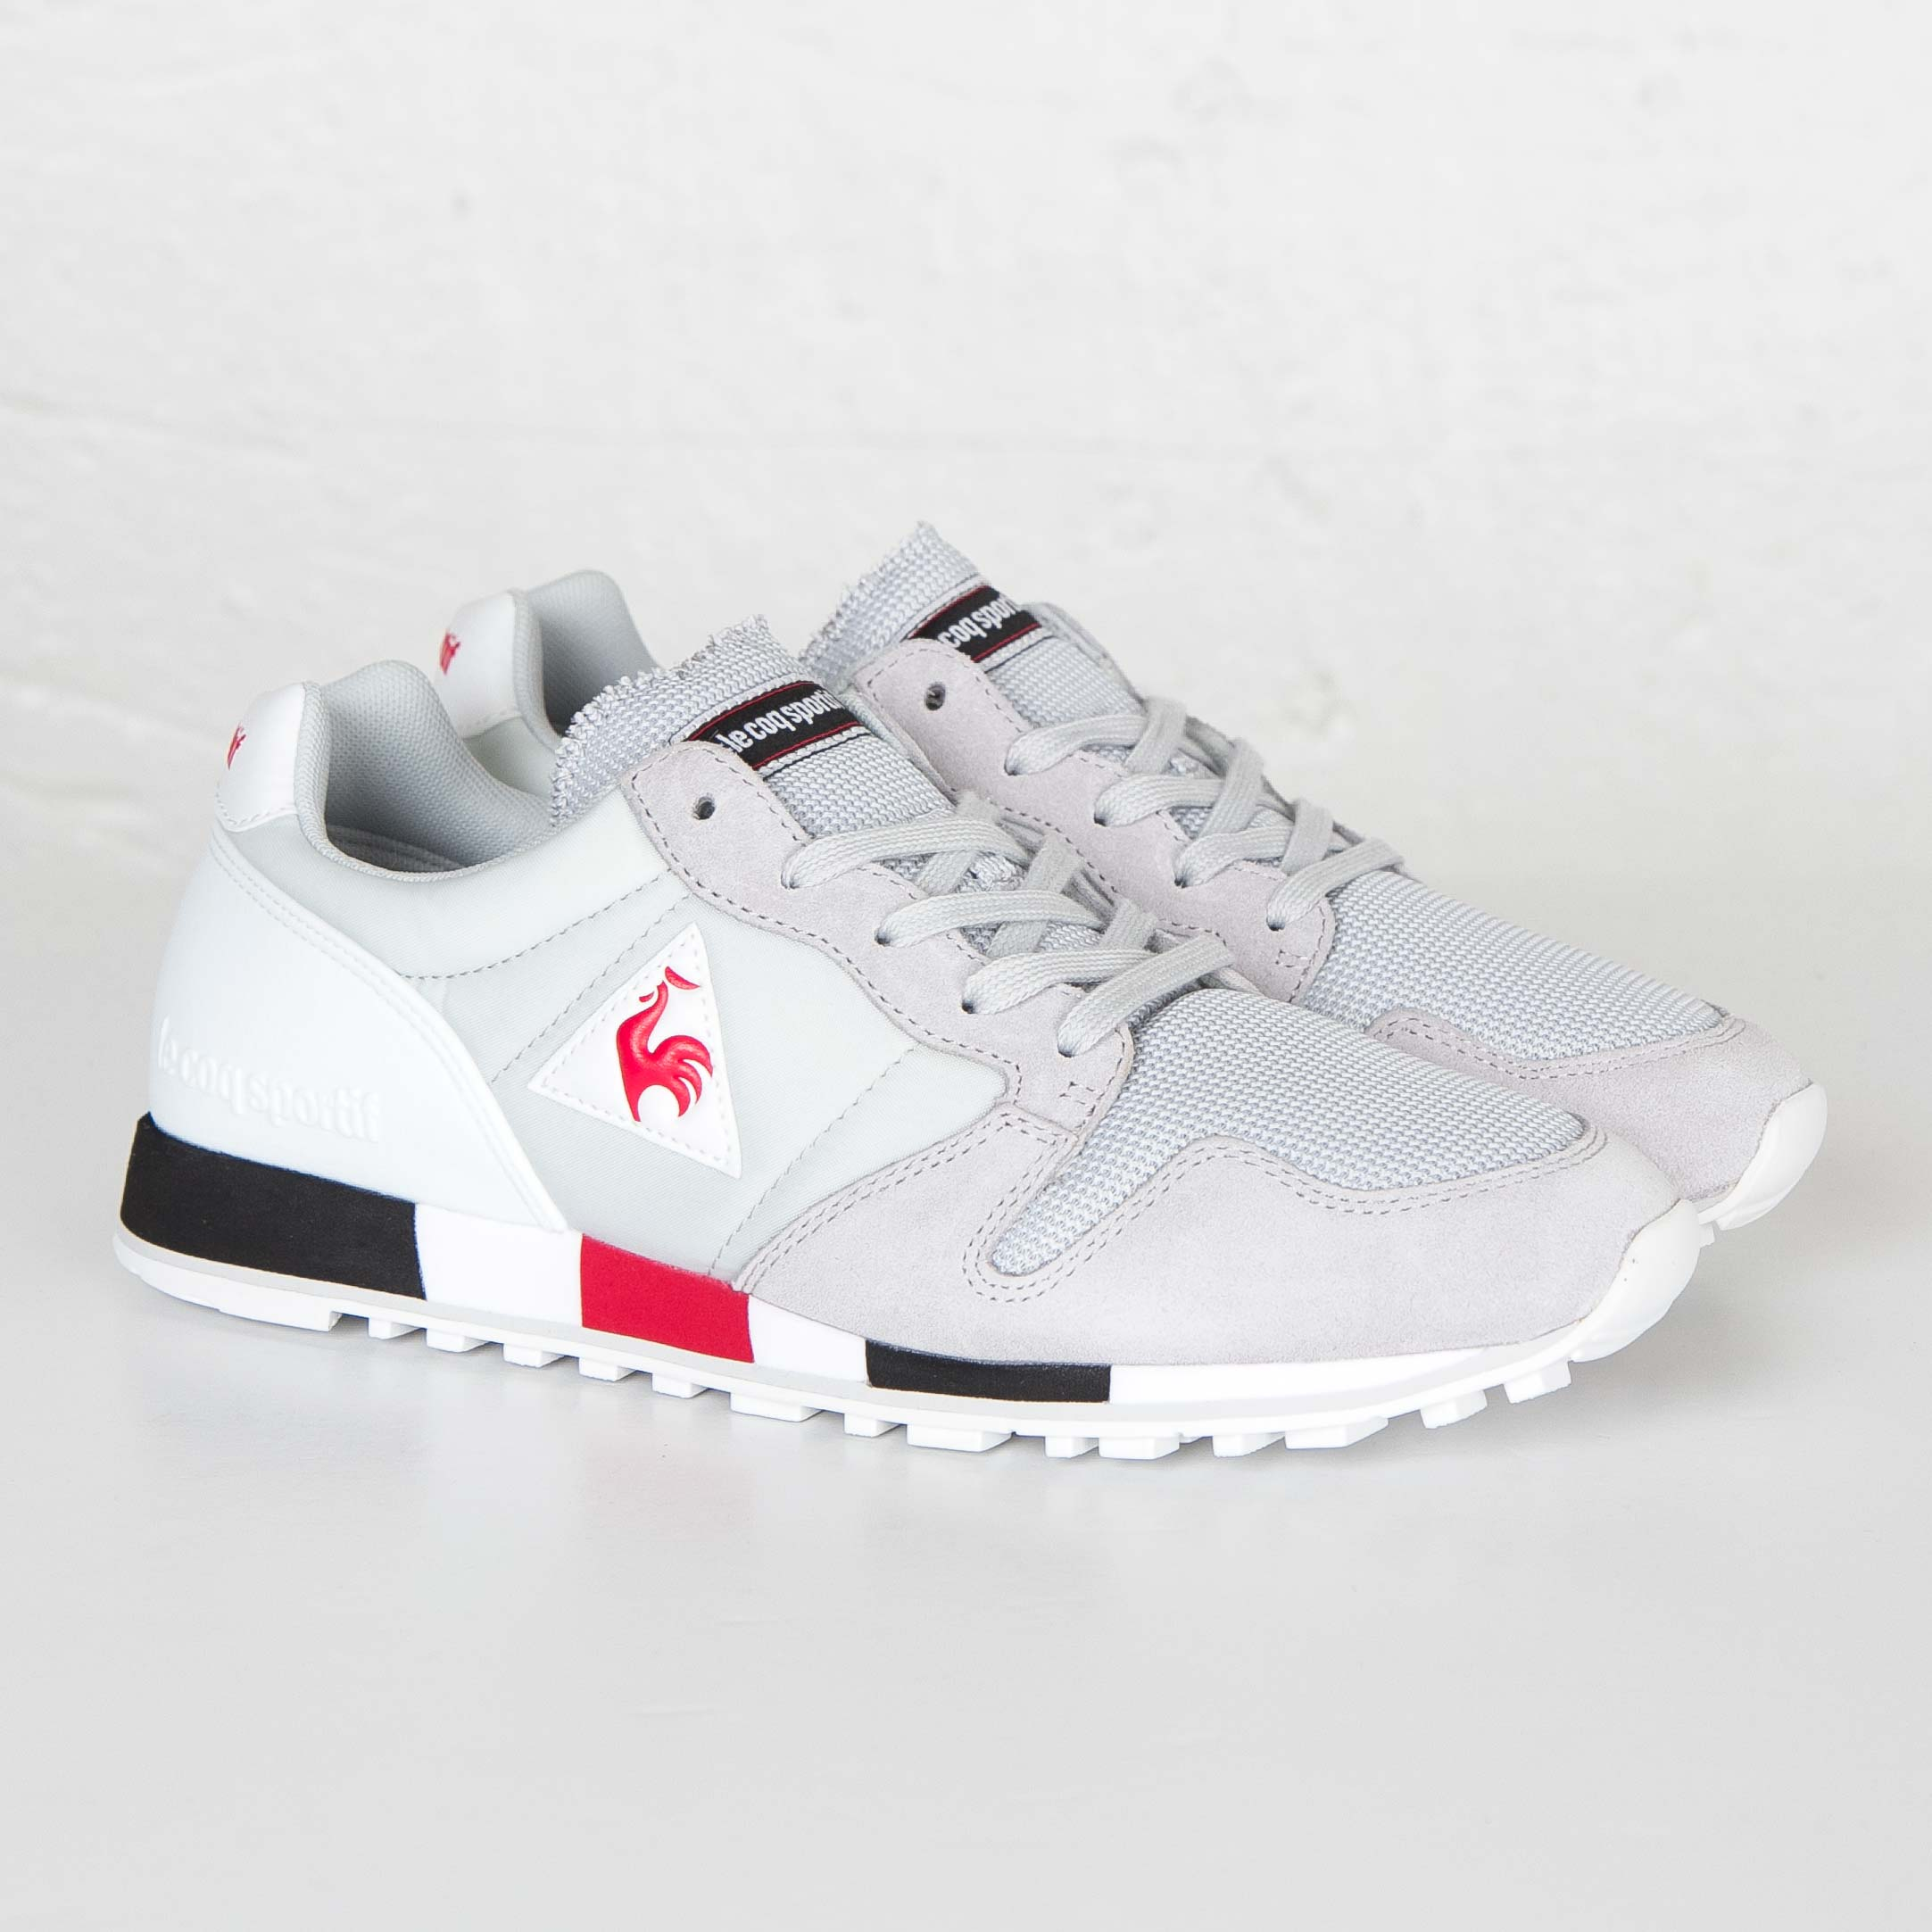 OMEGA ORIGINAL - FOOTWEAR - Low-tops & sneakers Le Coq Sportif y6CbXM